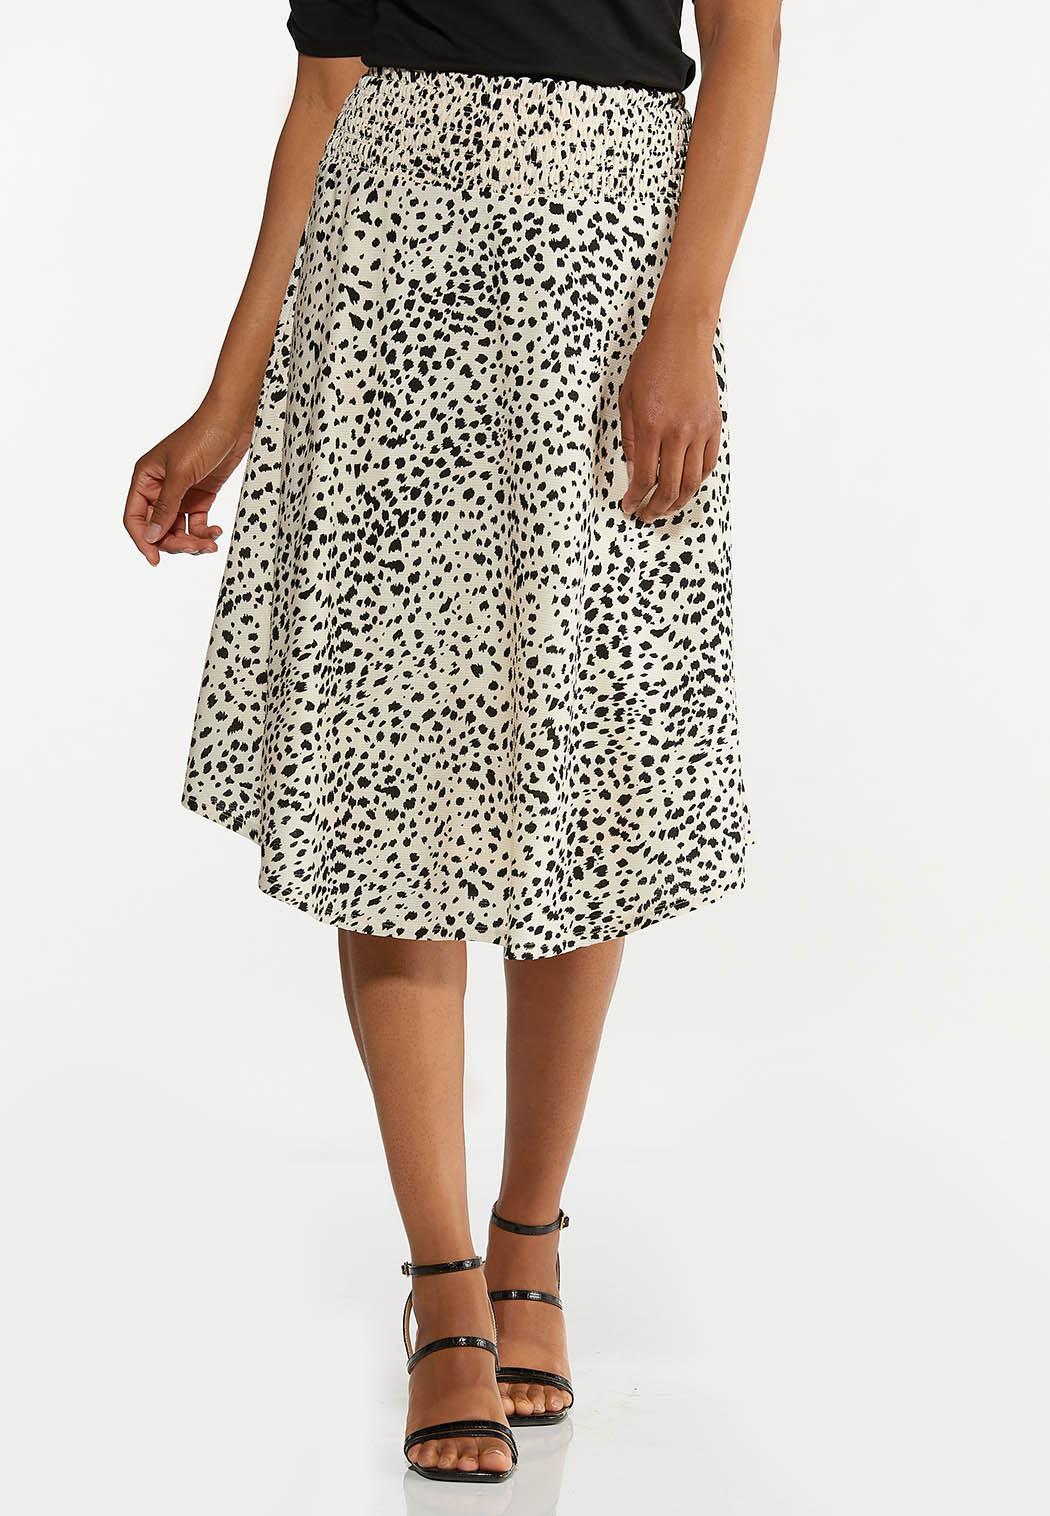 Plus Size Textured Animal Print Skirt